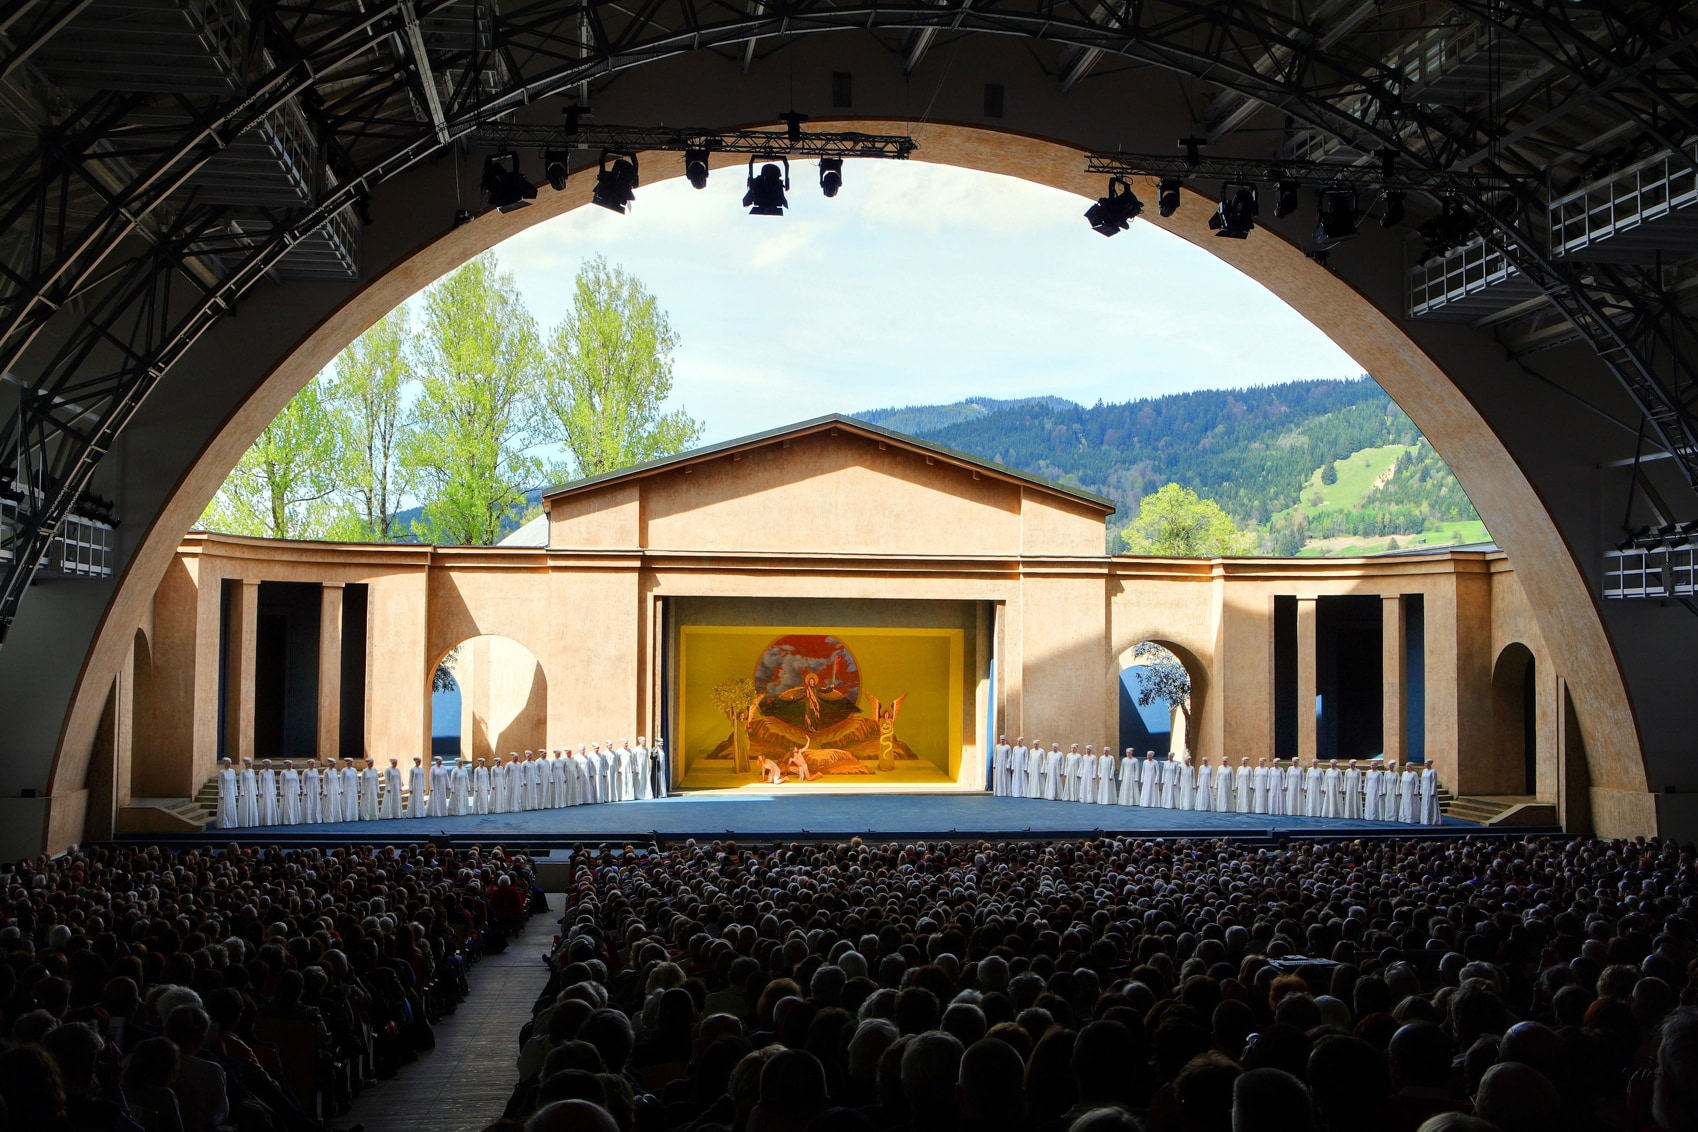 Incredible German Sights passion_play_theater_oberammergau_c_foto_kienberger-CREDIT-Oberammagau-Passion-Play-2020